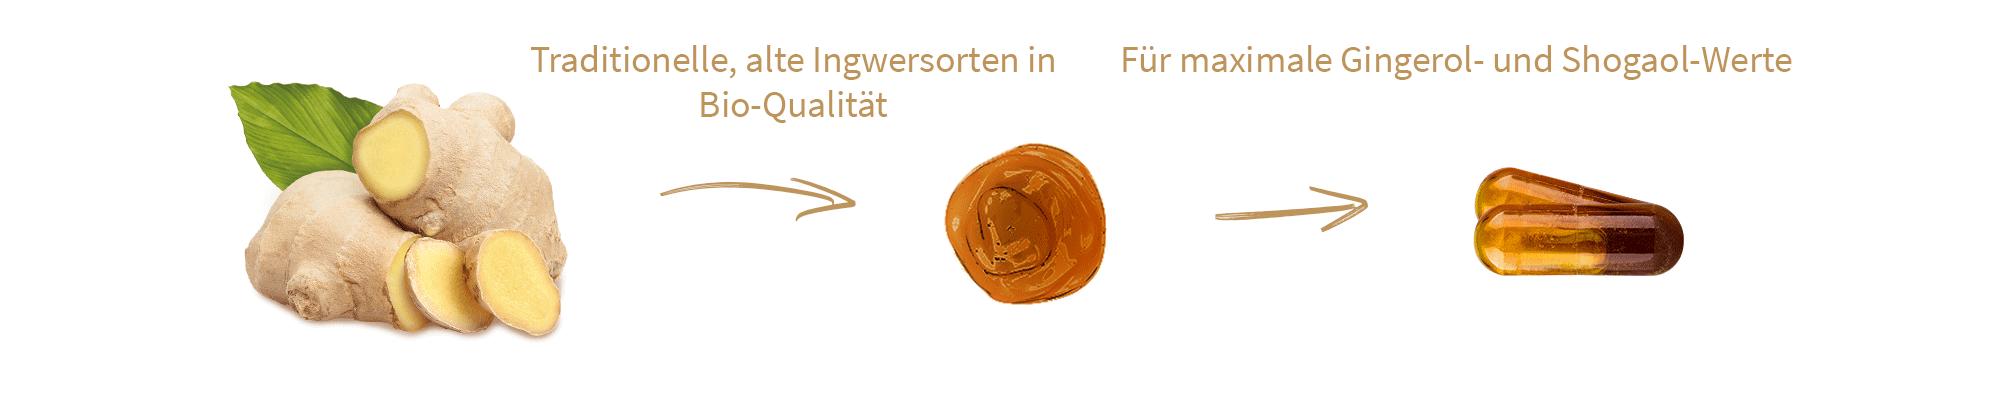 ingwer-kapseln-liquid